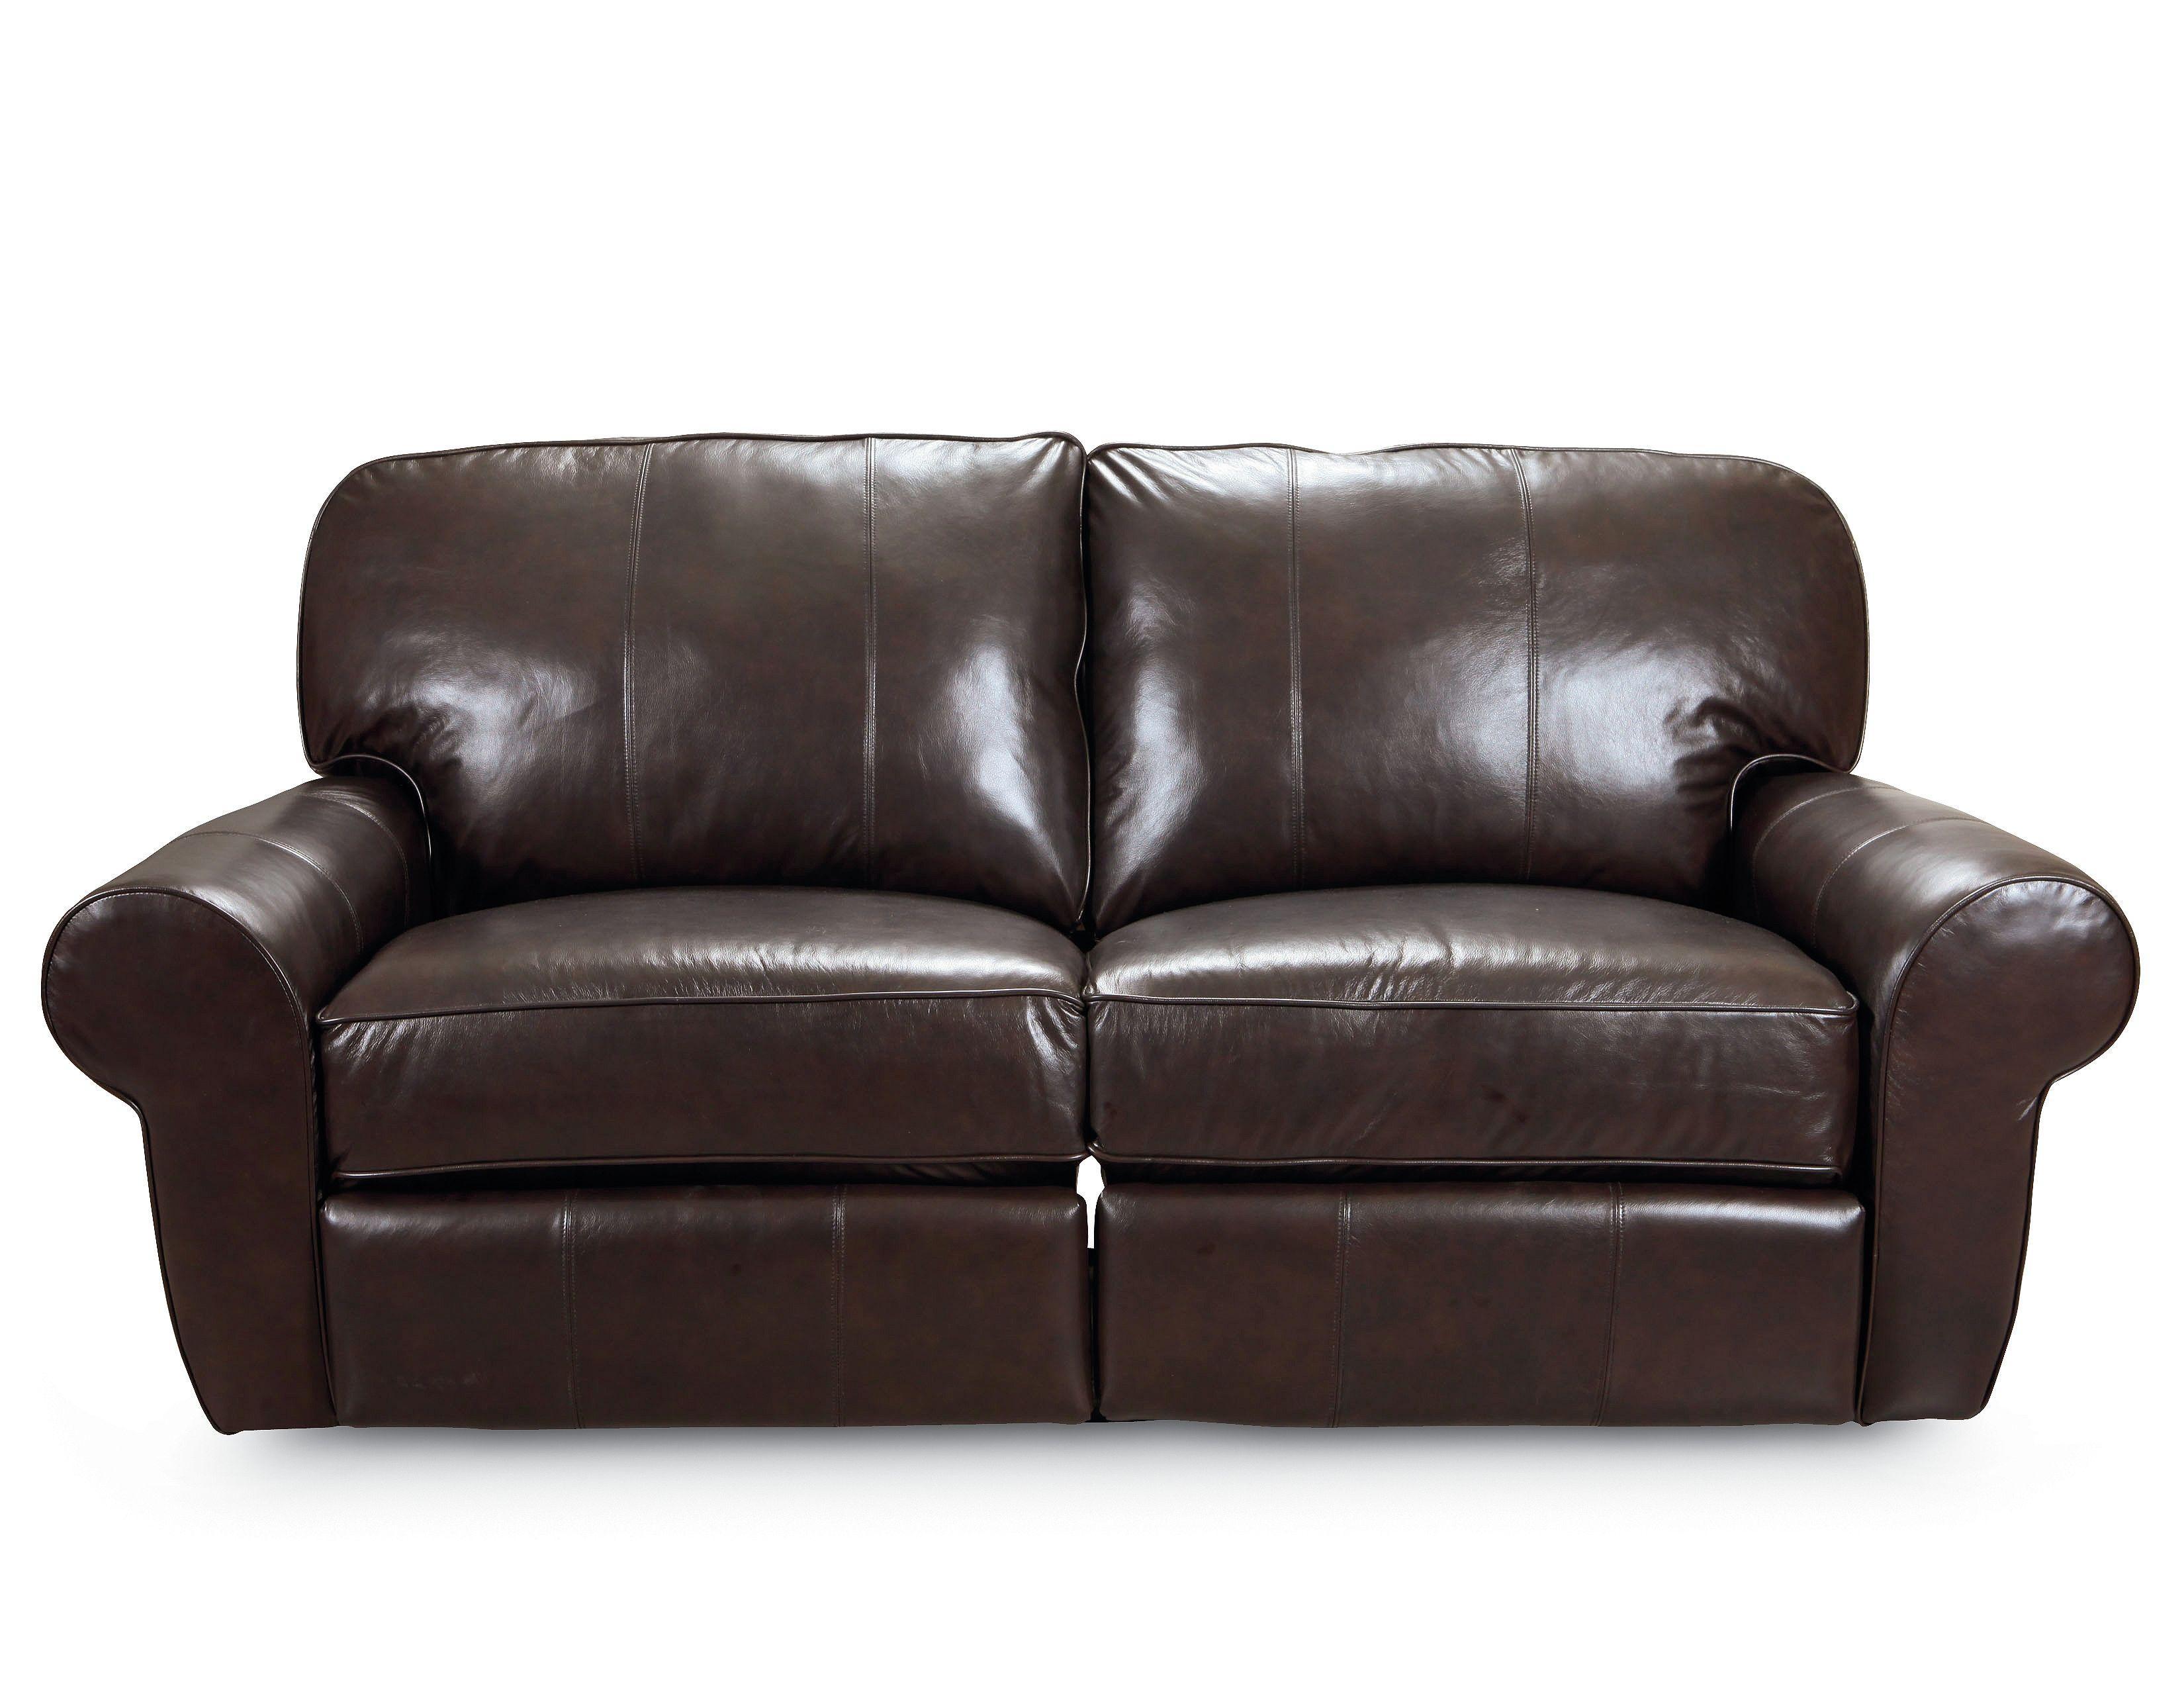 Lane Megan 343-39 Double Reclining Sofa